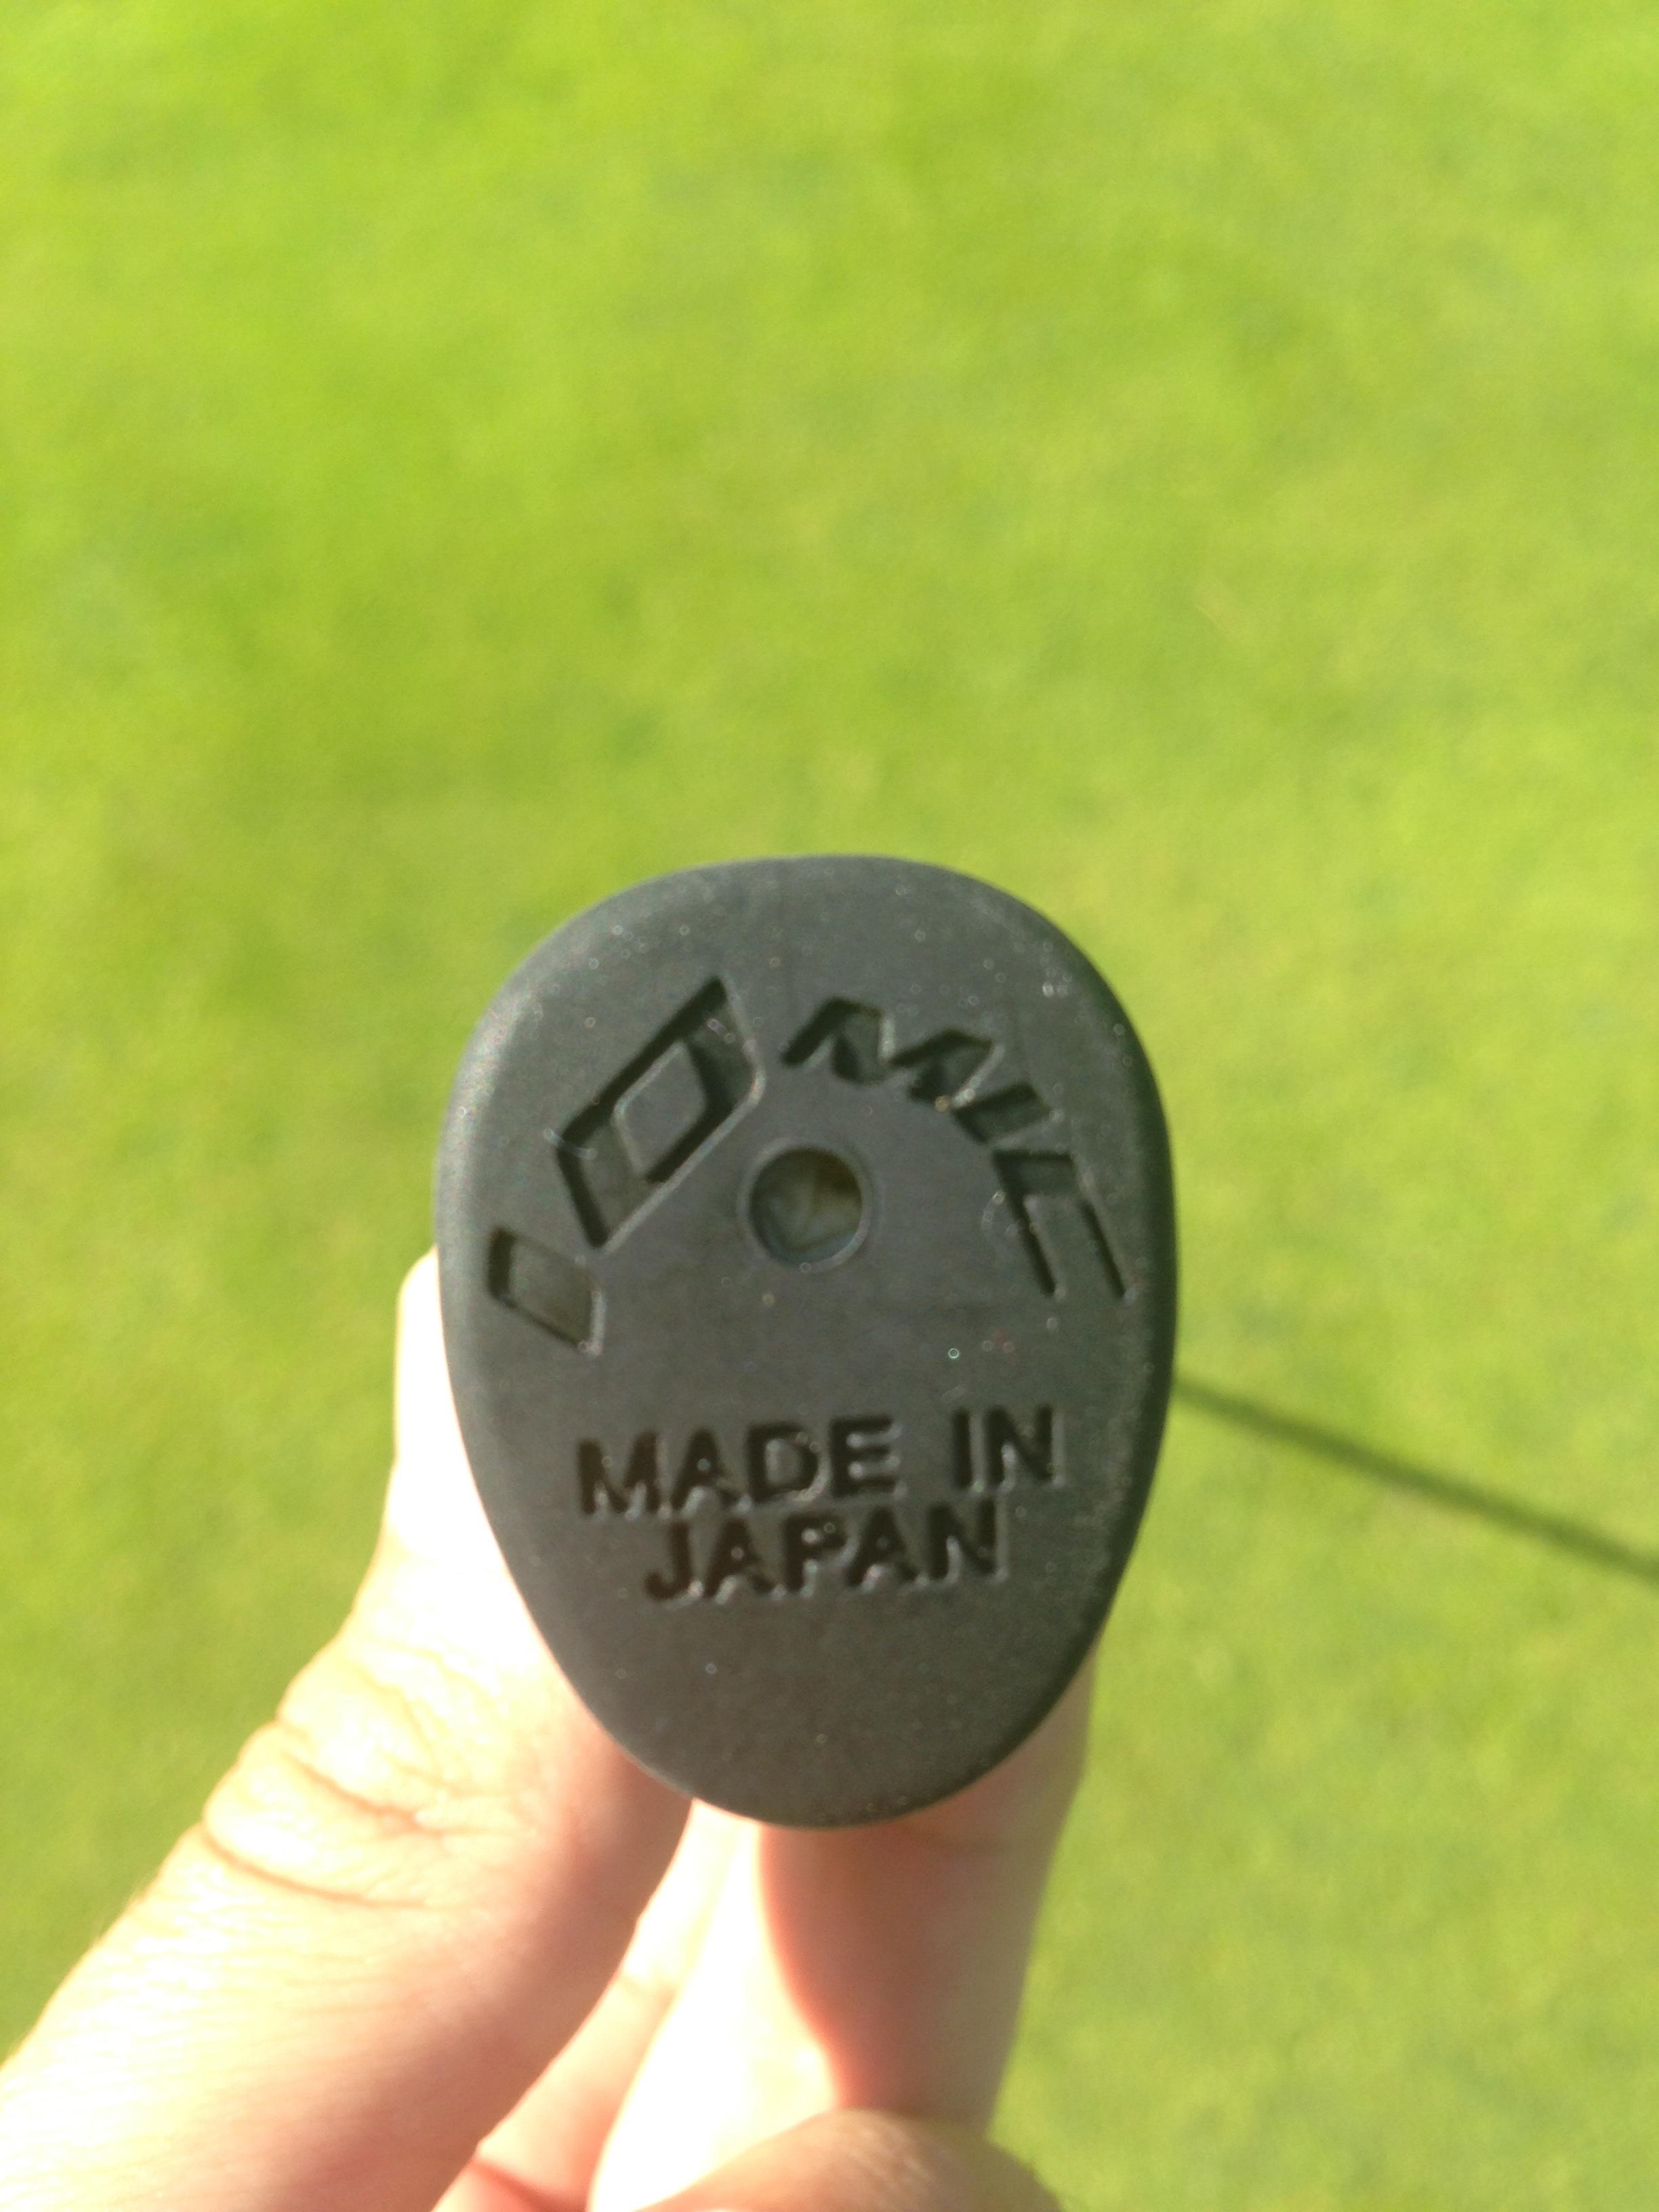 piretti putter review golf by josh hirst pga professional